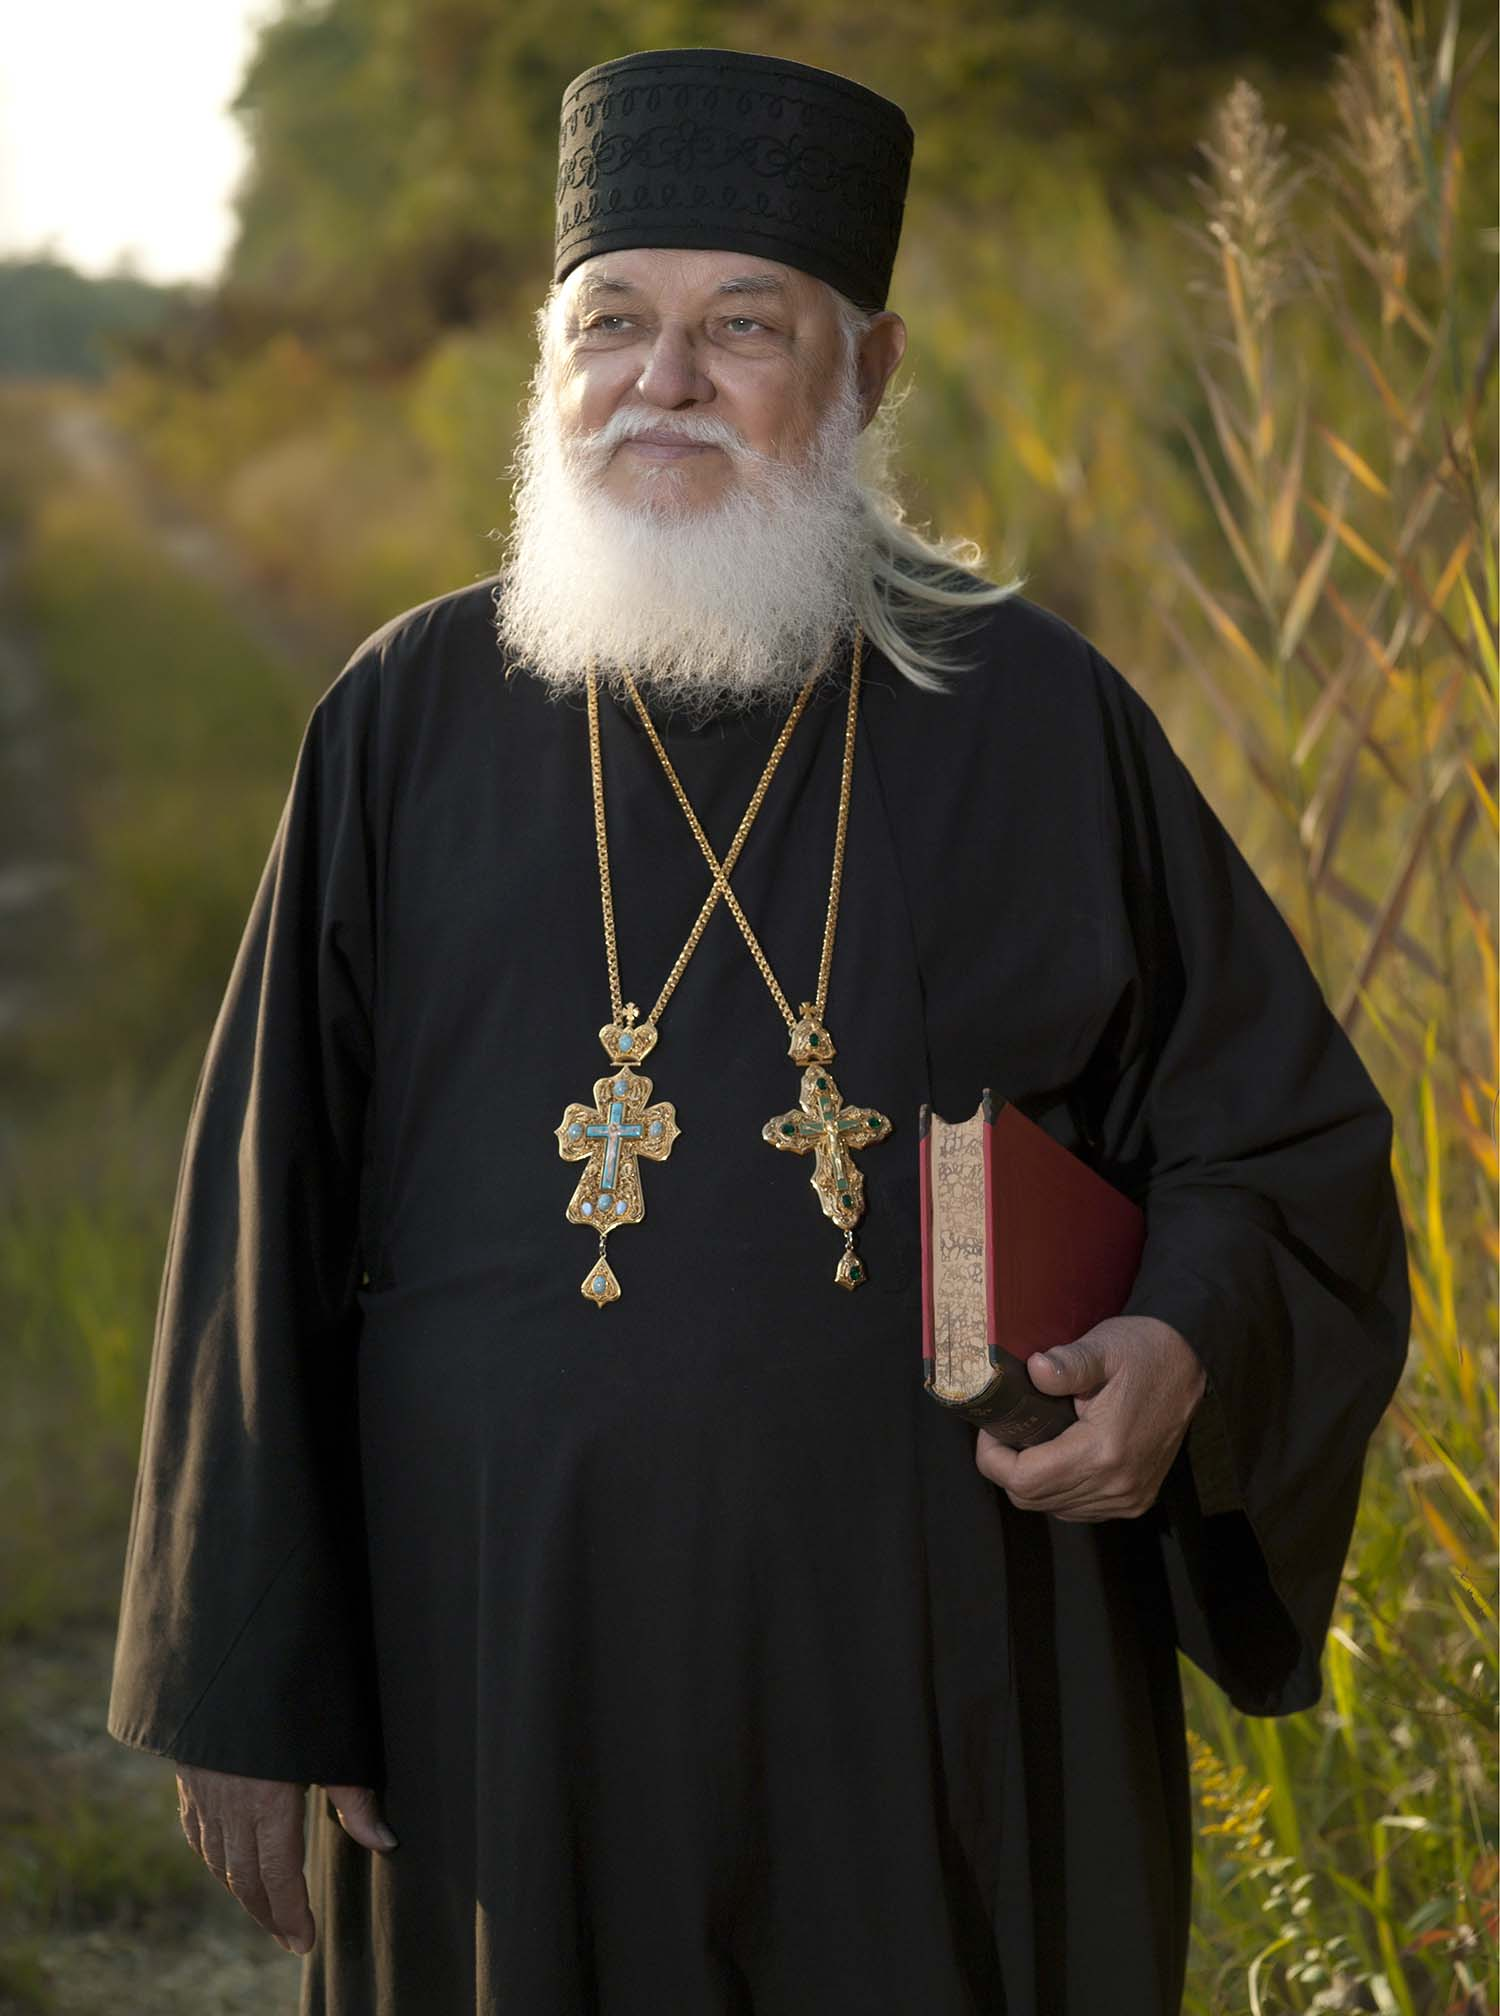 Protopresbyter Valery Lukianov